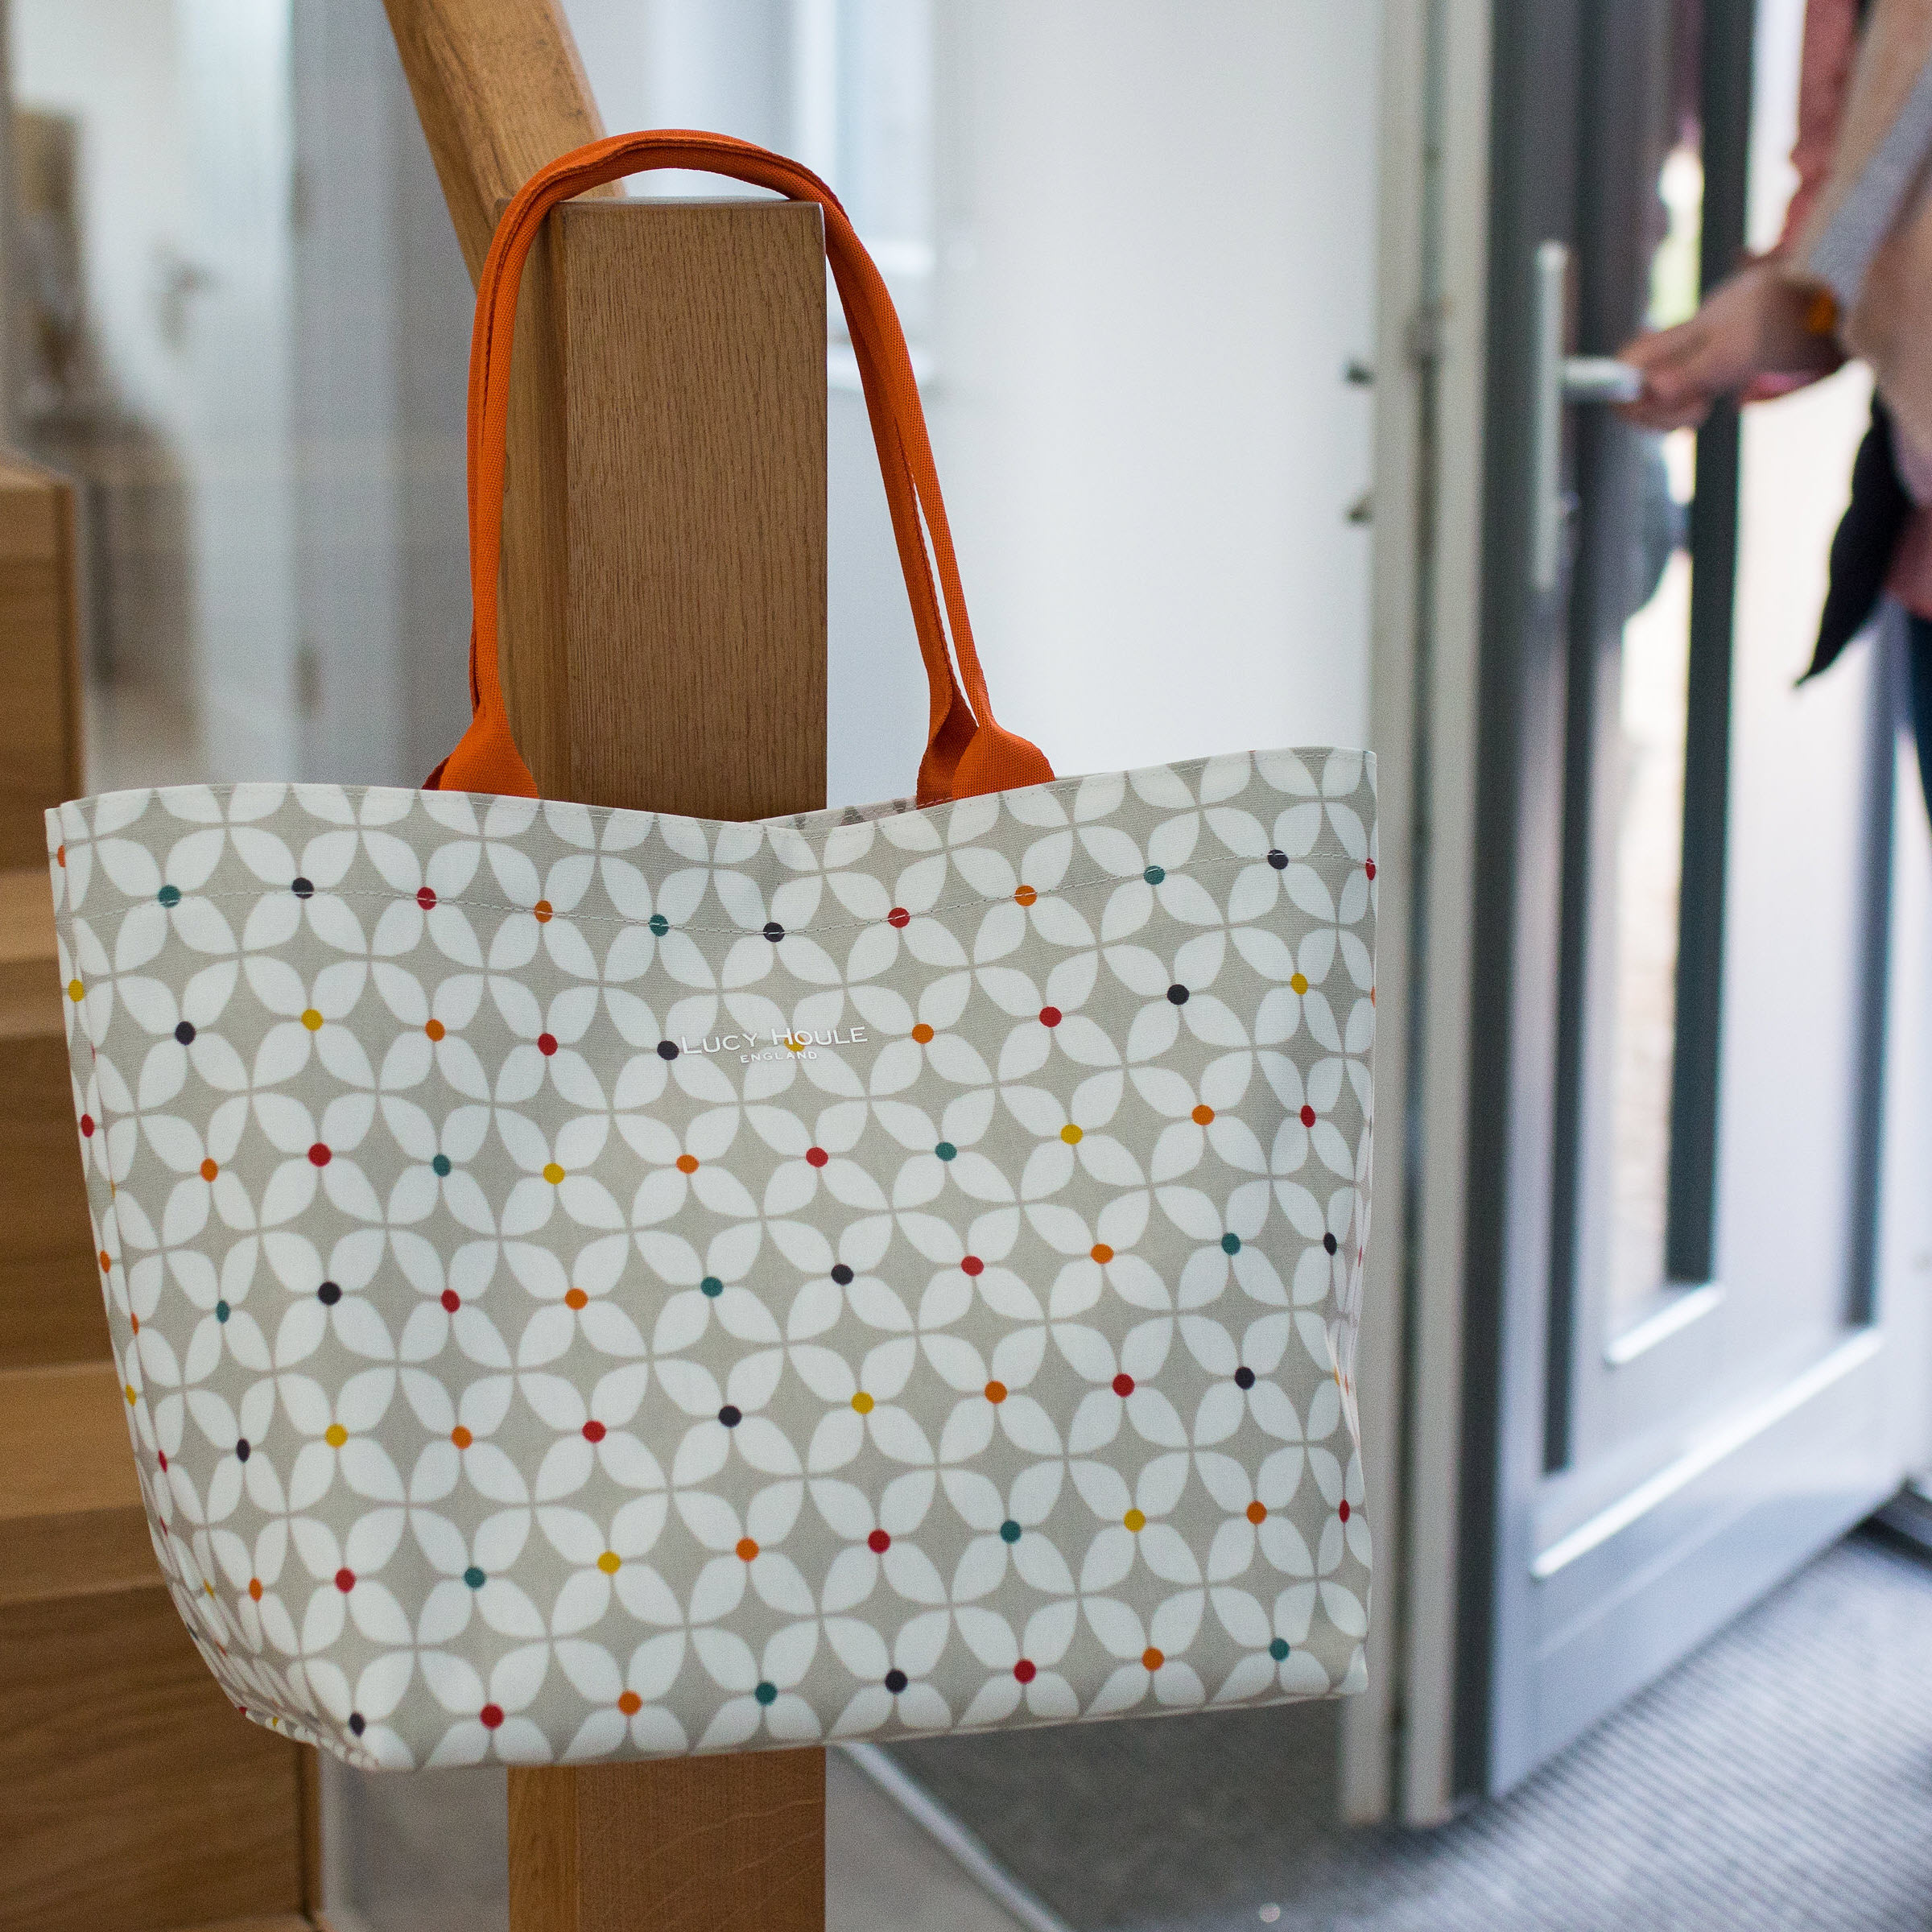 Modern Daisy Taupe Medium Tote Bag with Orange Handles